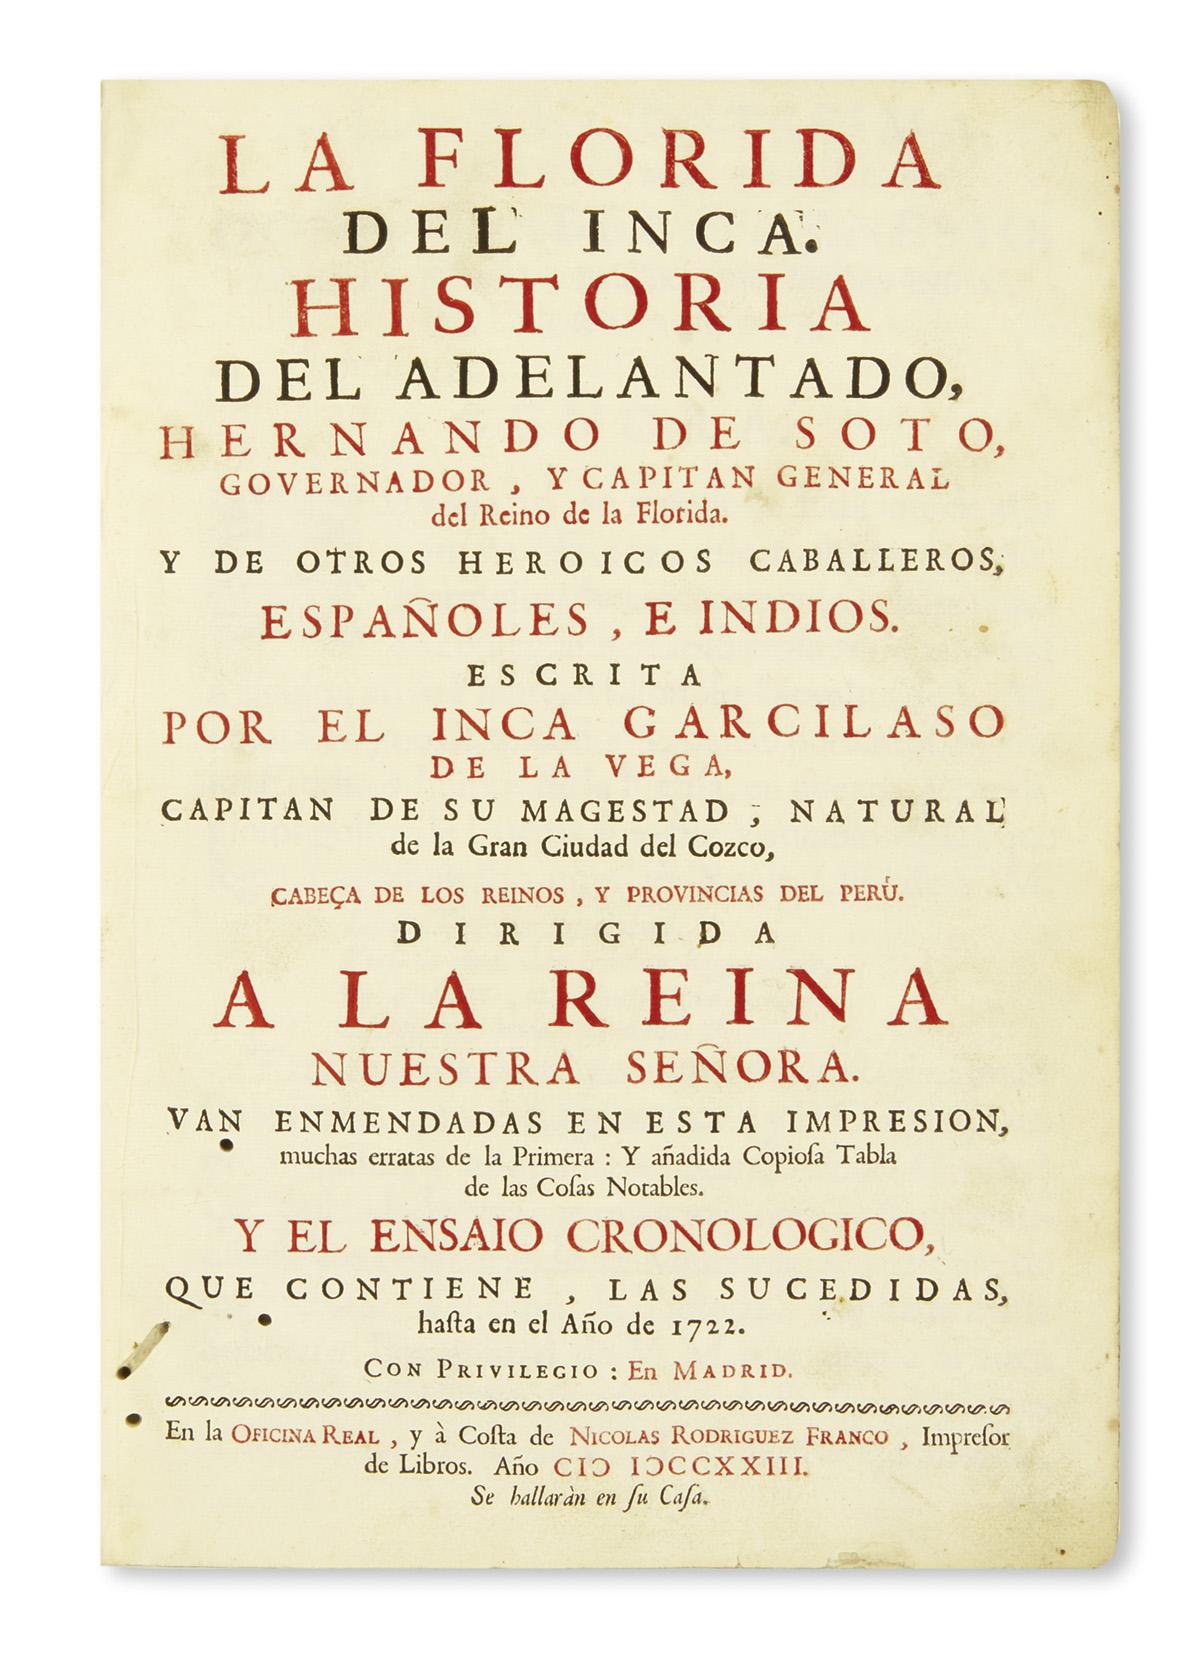 (FLORIDA)-Lasso-de-la-Vega-García-La-Florida-del-Inca-histor